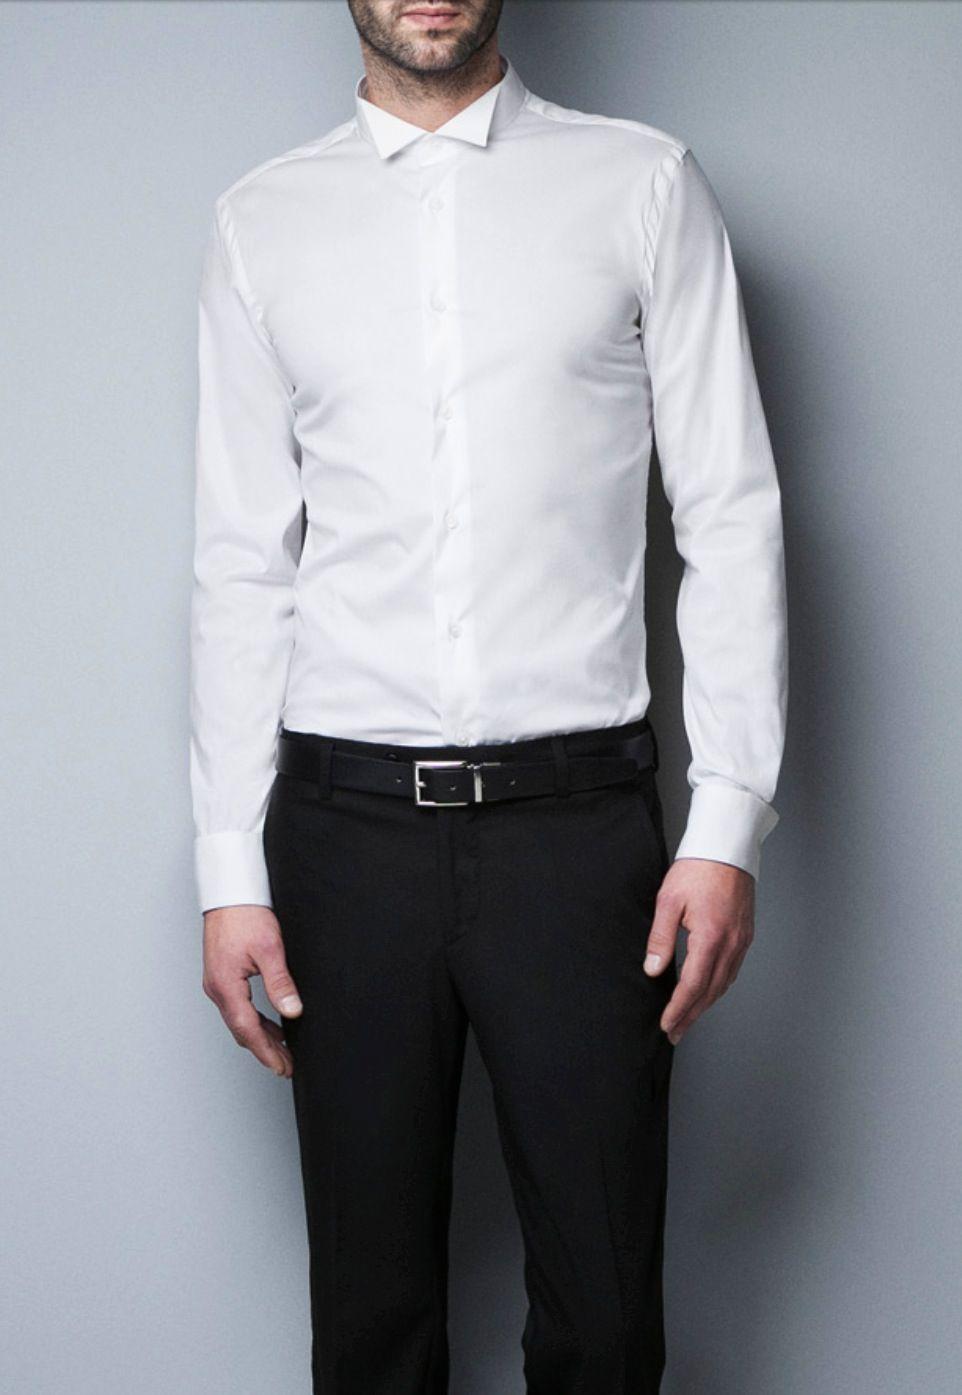 Zara Men Tuxedo shirt - mix with casual jumper | How to ...